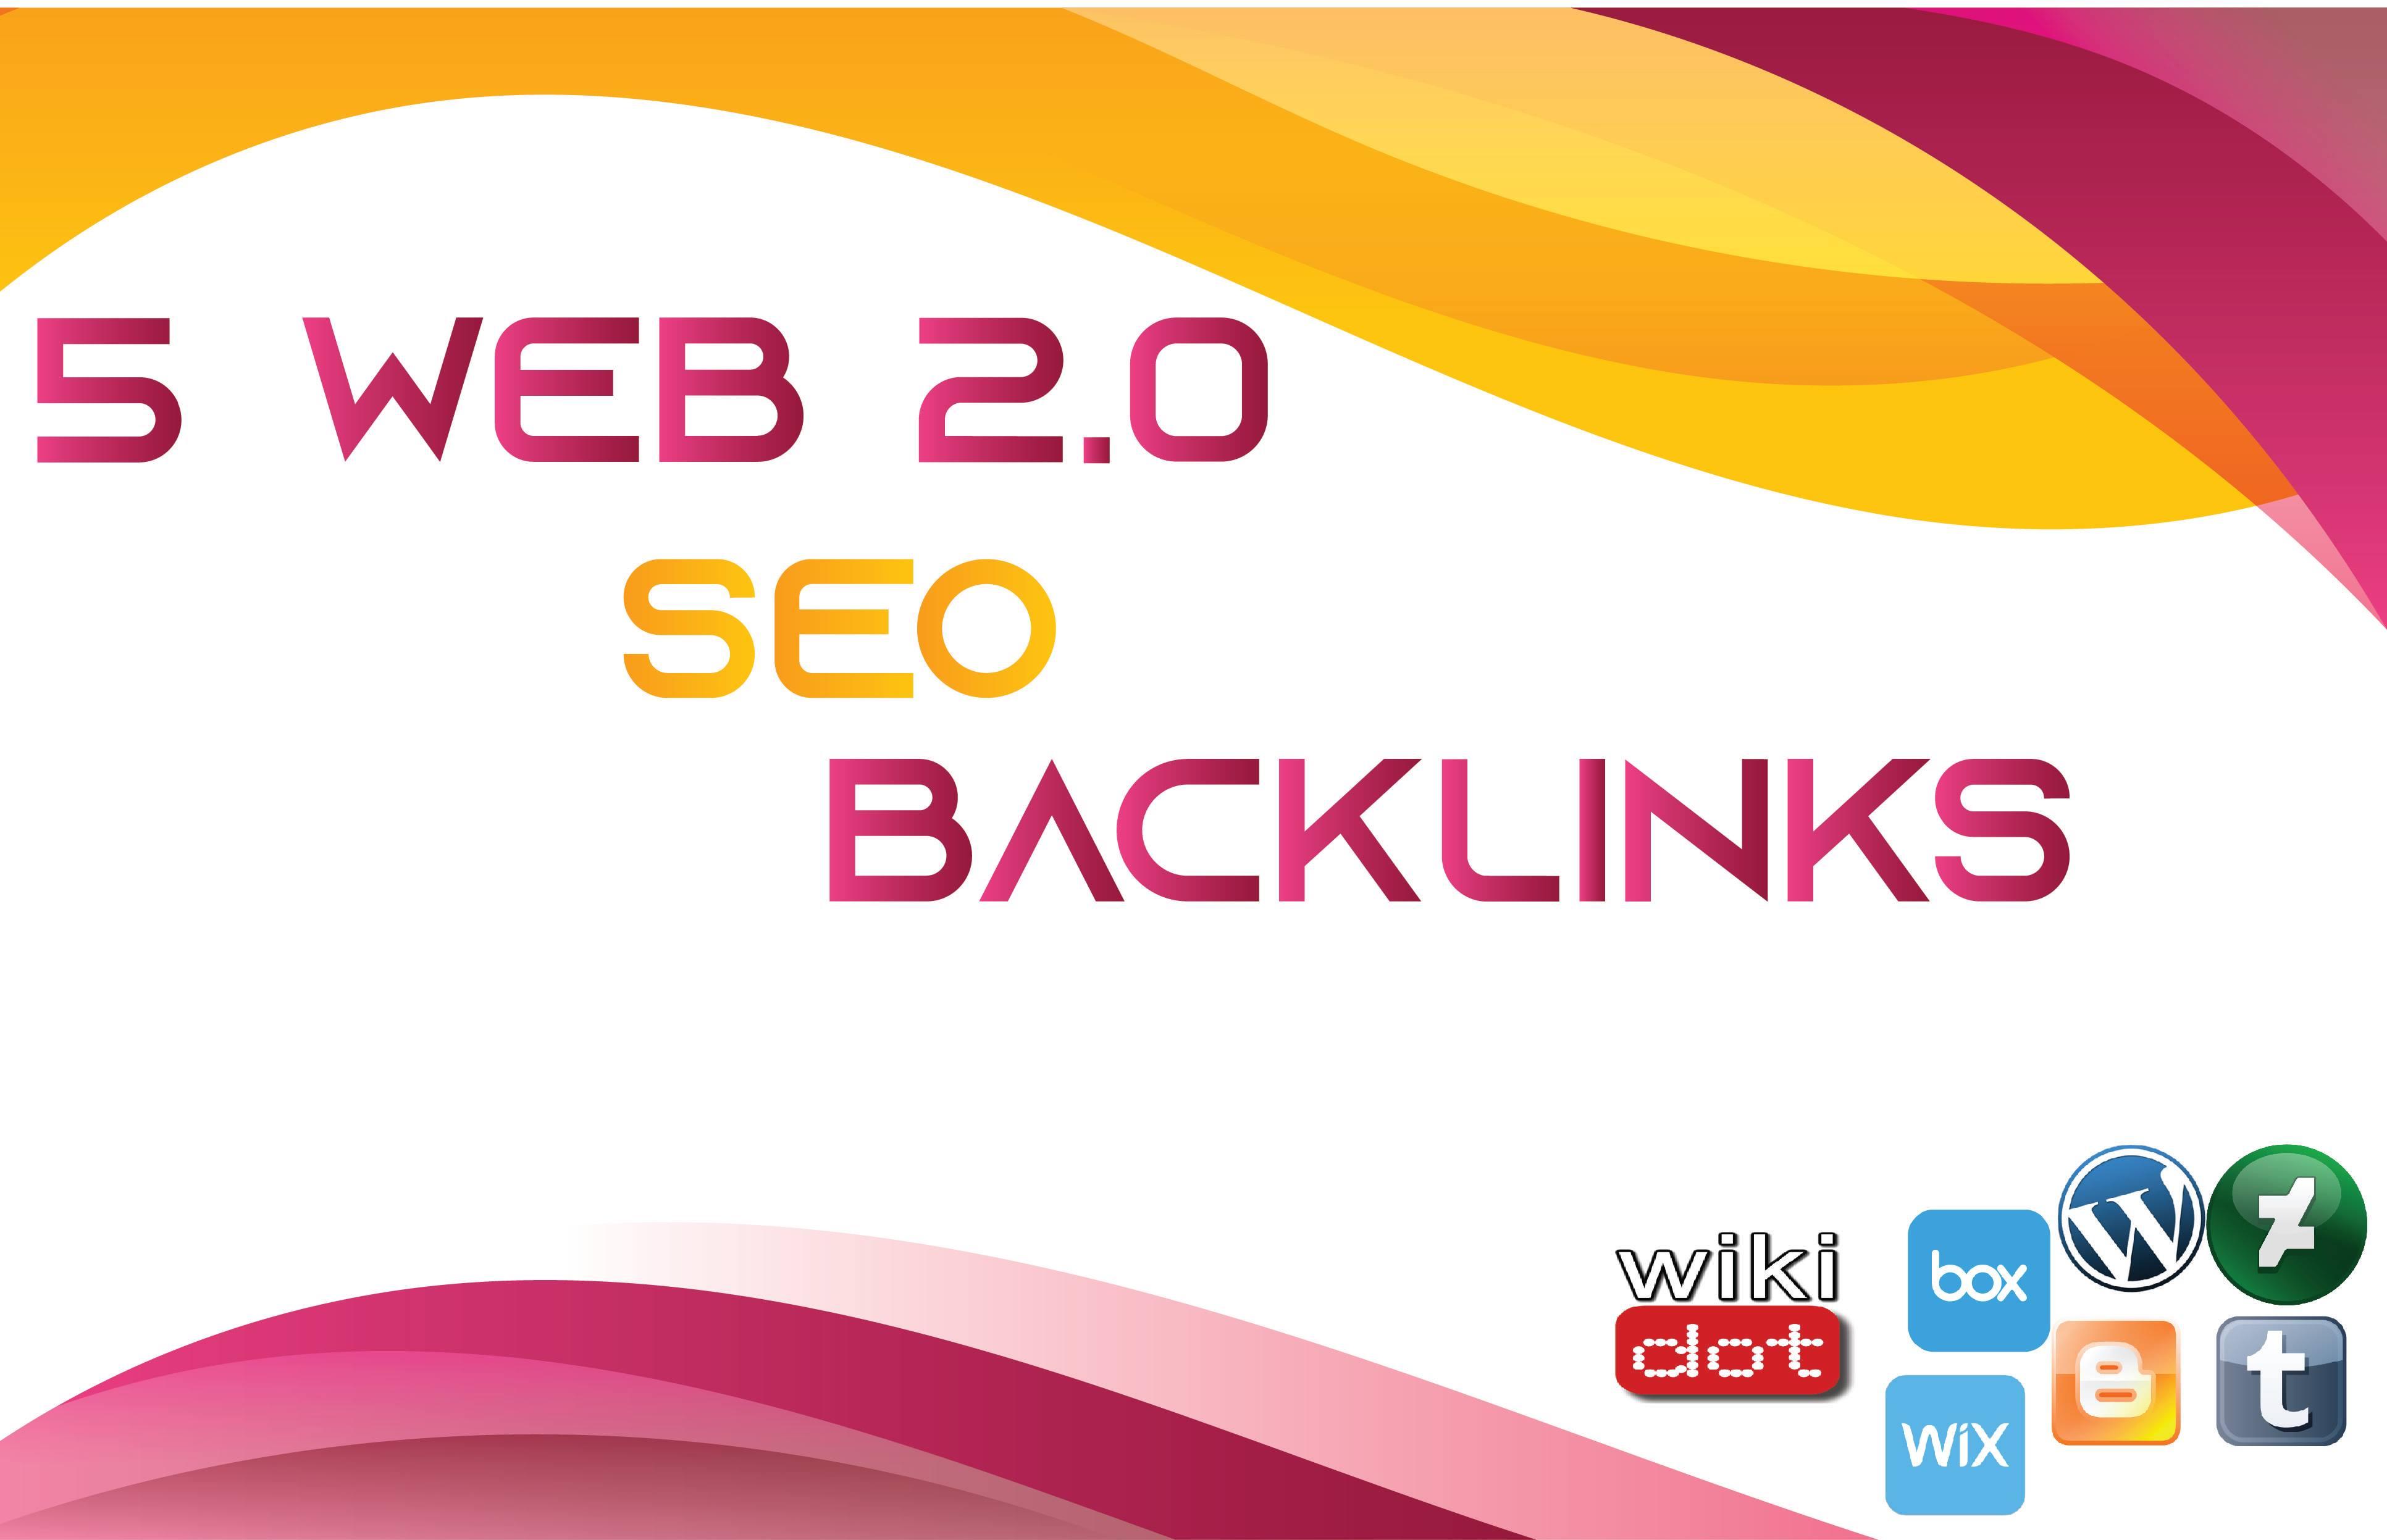 5 Web 2.0 Contextual SEO Backlinks Unique Domain